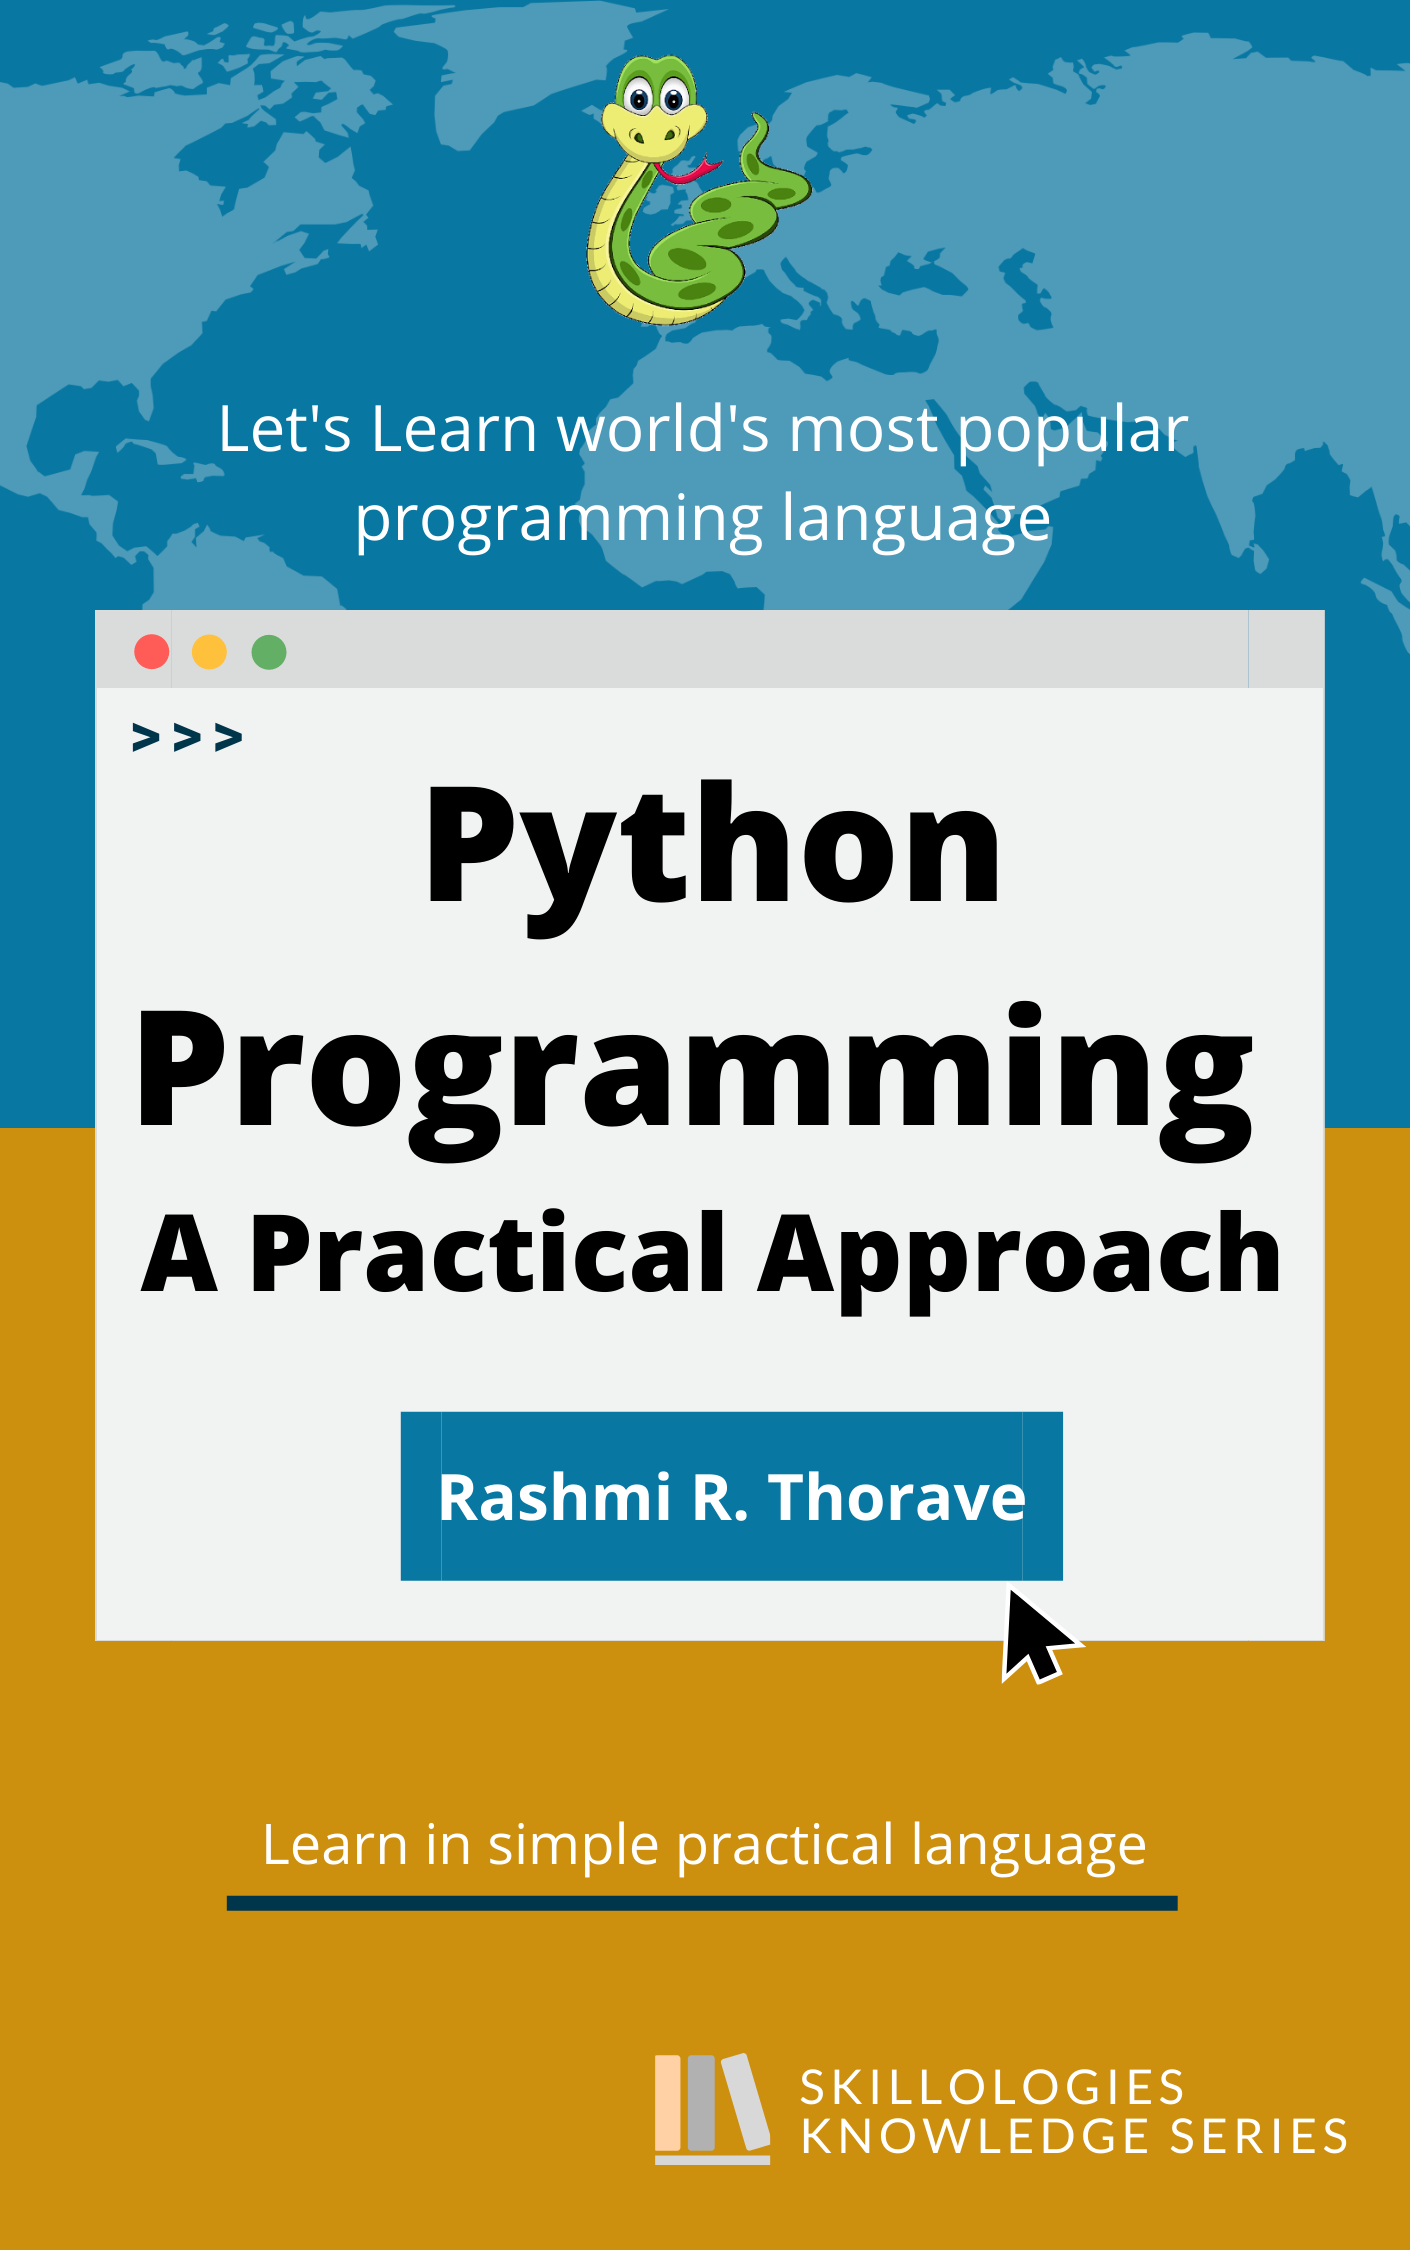 Python Programming eBook - MITU Skillologies